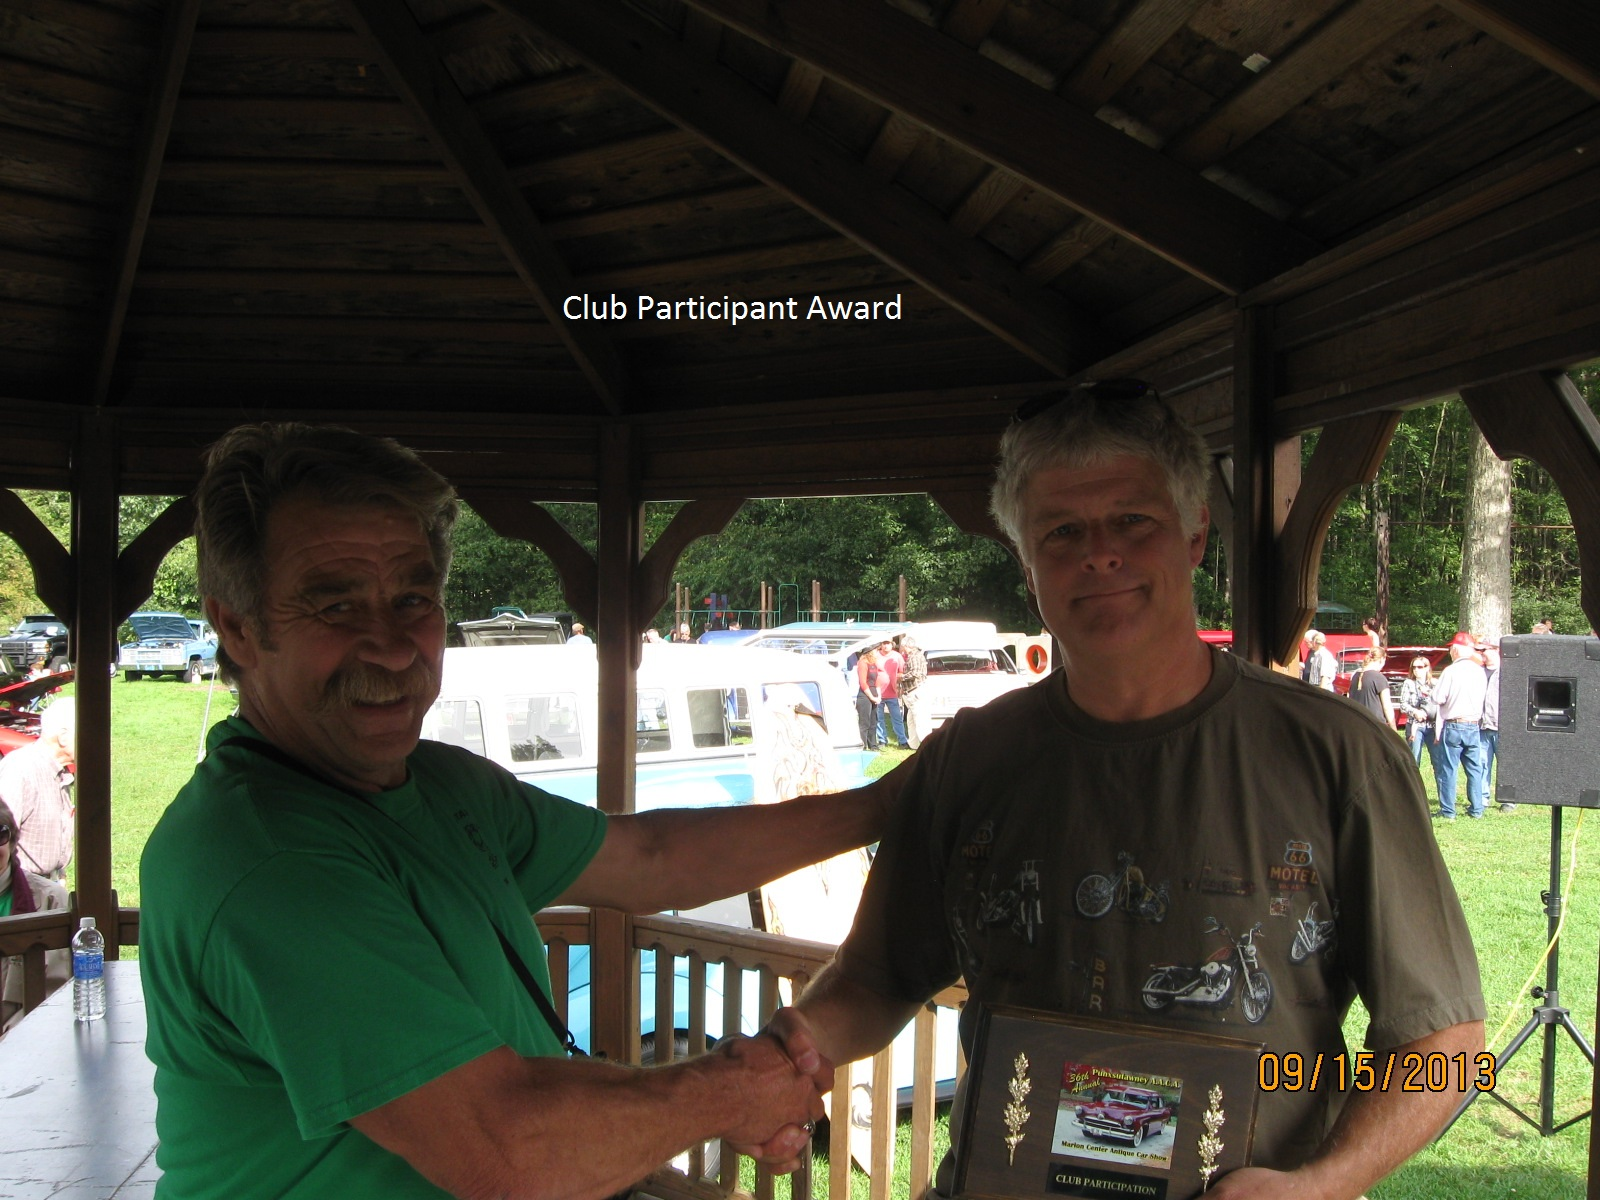 Club Participant Award Winner